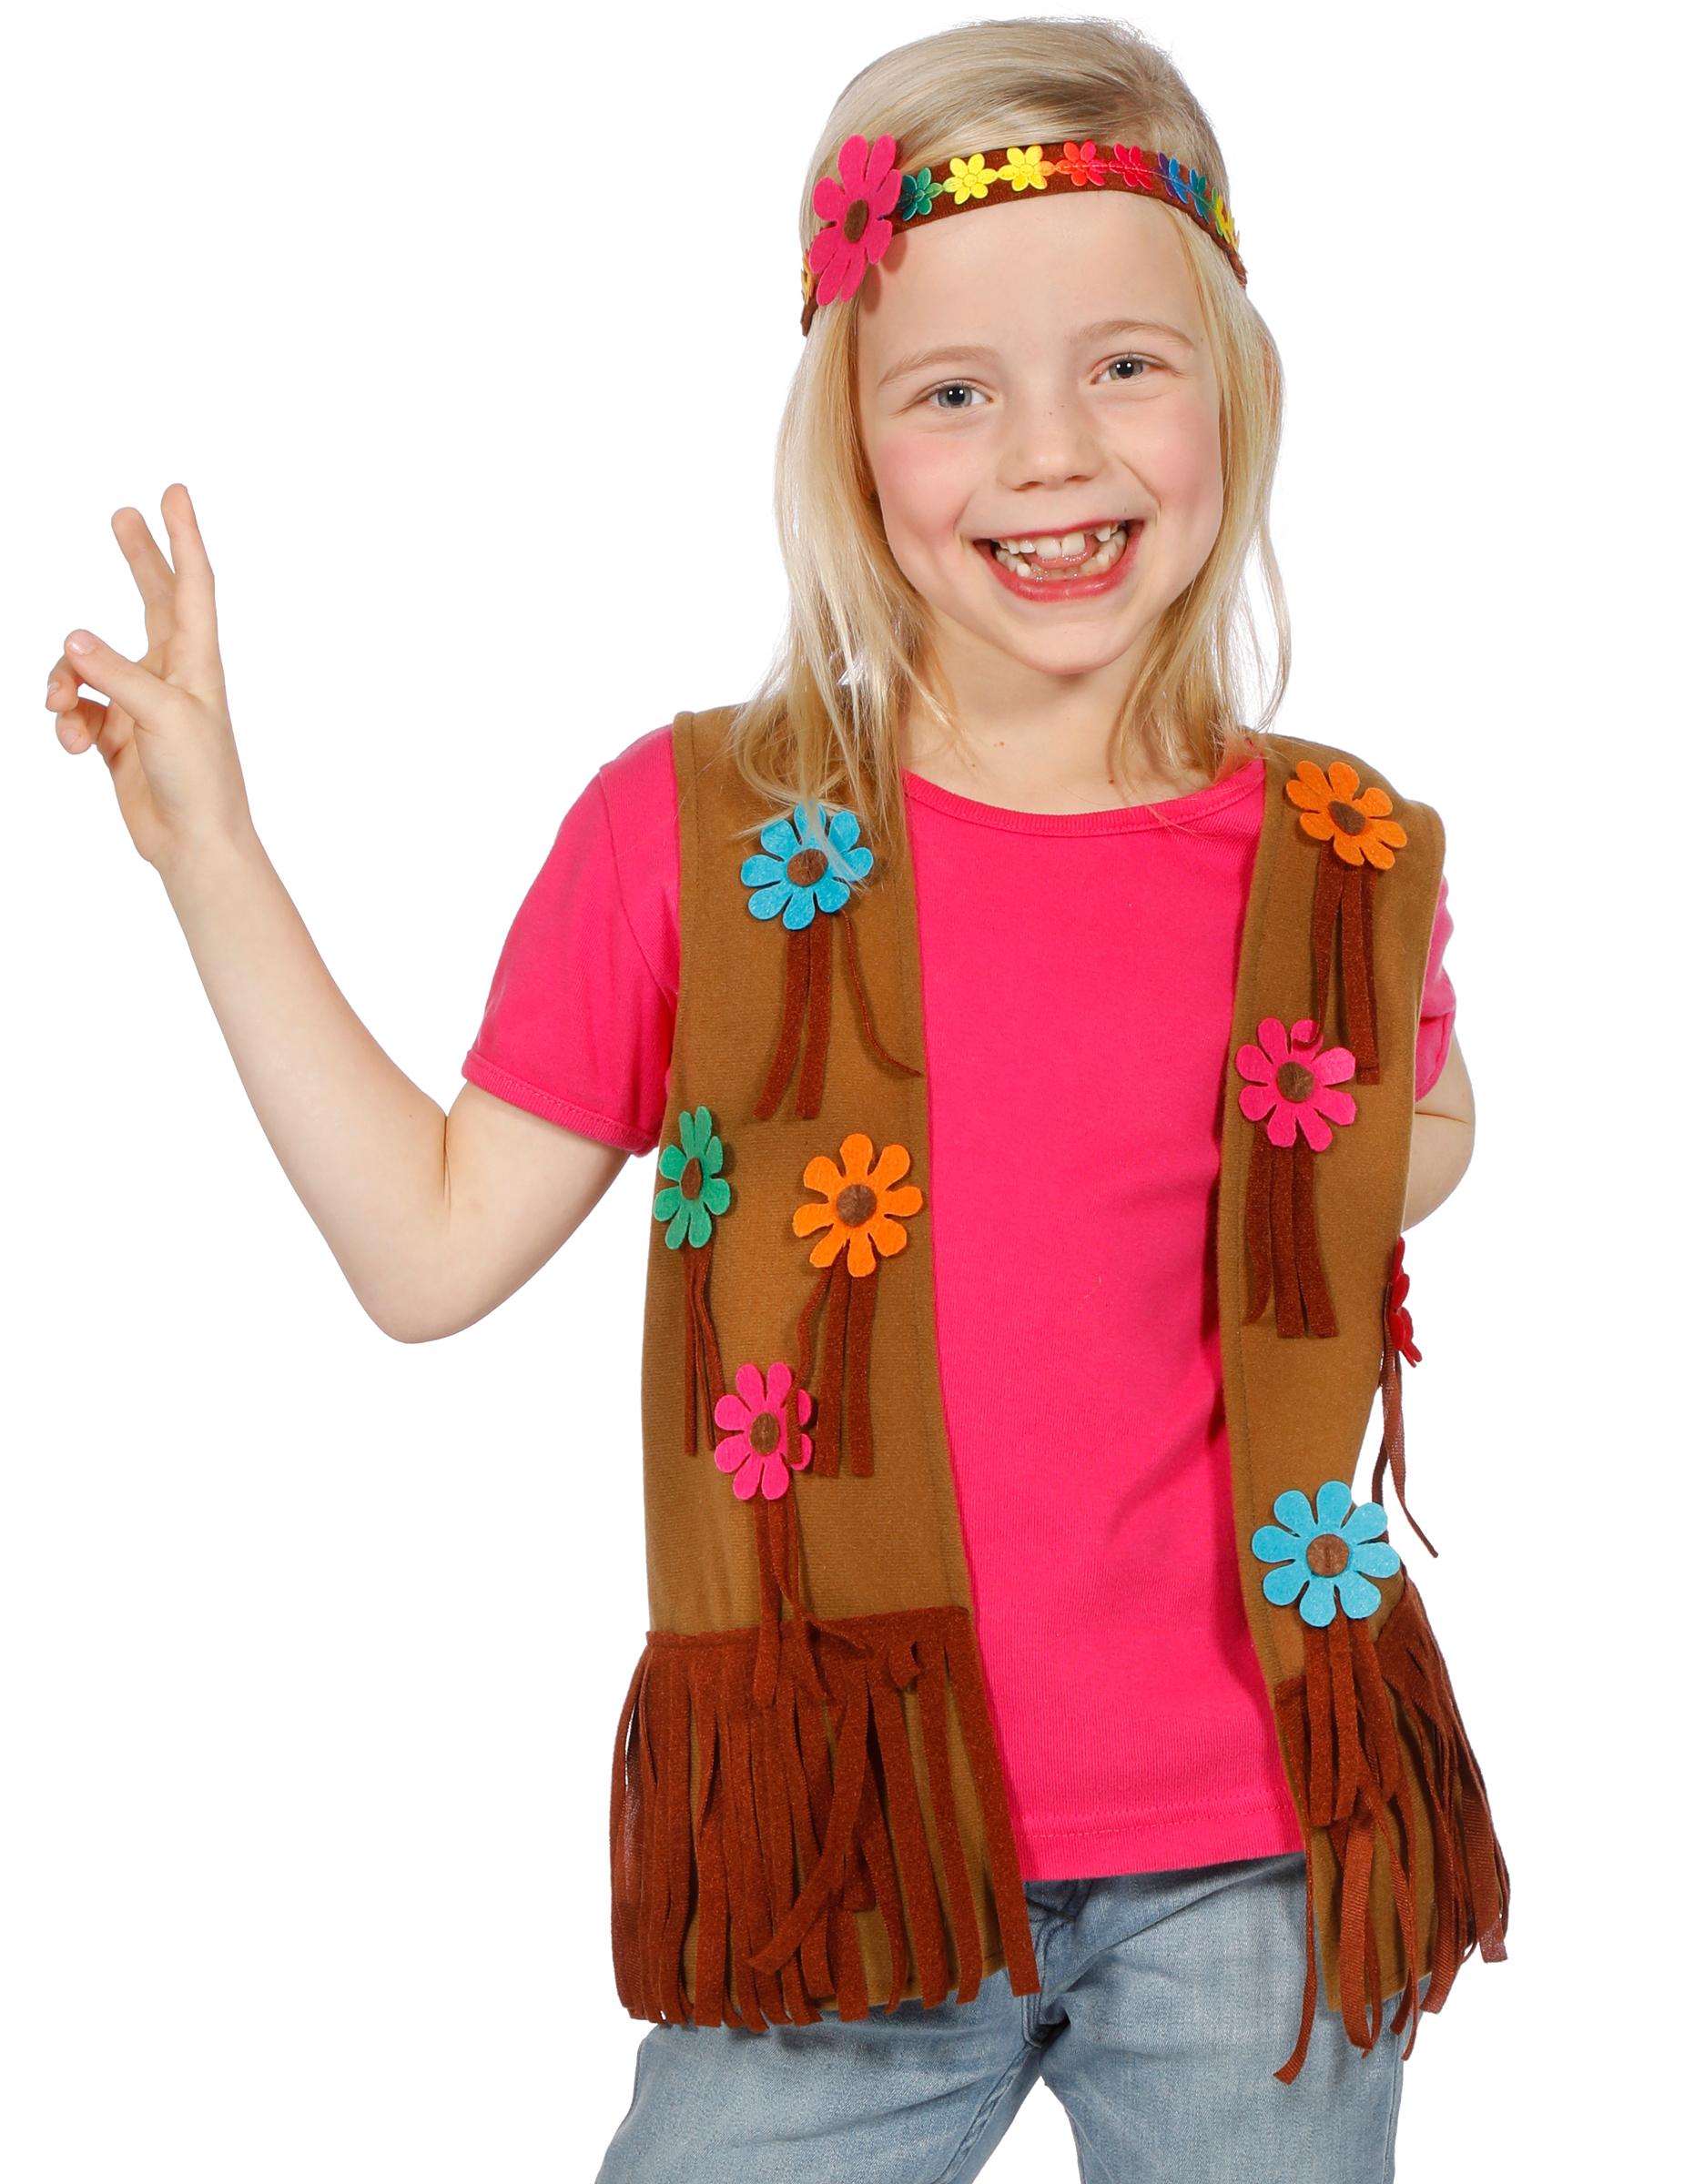 hippie weste und stirnband f r kinder braun bunt g nstige faschings kost me bei karneval megastore. Black Bedroom Furniture Sets. Home Design Ideas